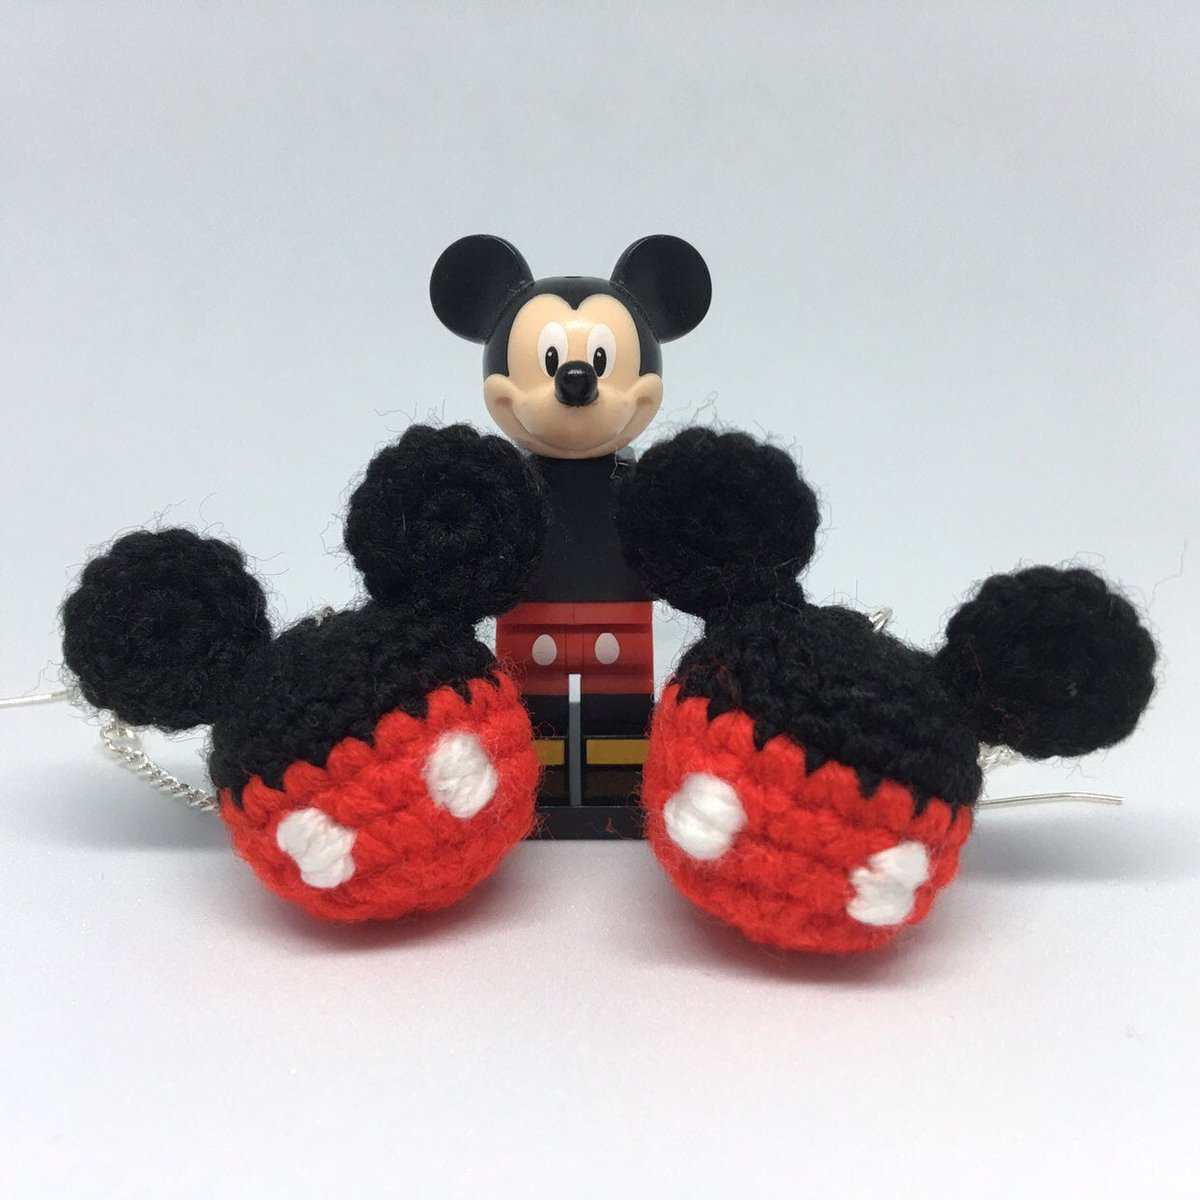 Mickey Mouse Inspired Pom Pom Earrings #handmade #HandmadeInUK #HandmadeHour #womaninbiz #wnukrt #womaninbizhour #CraftBizParty #etsy #Disney #Mickey #SmallBizSatUK #jewellery #smallbiz #BizHour #etsyshop #craft #gift #minnie #mickeymouse #minniemouse etsy.me/2vgNBRP